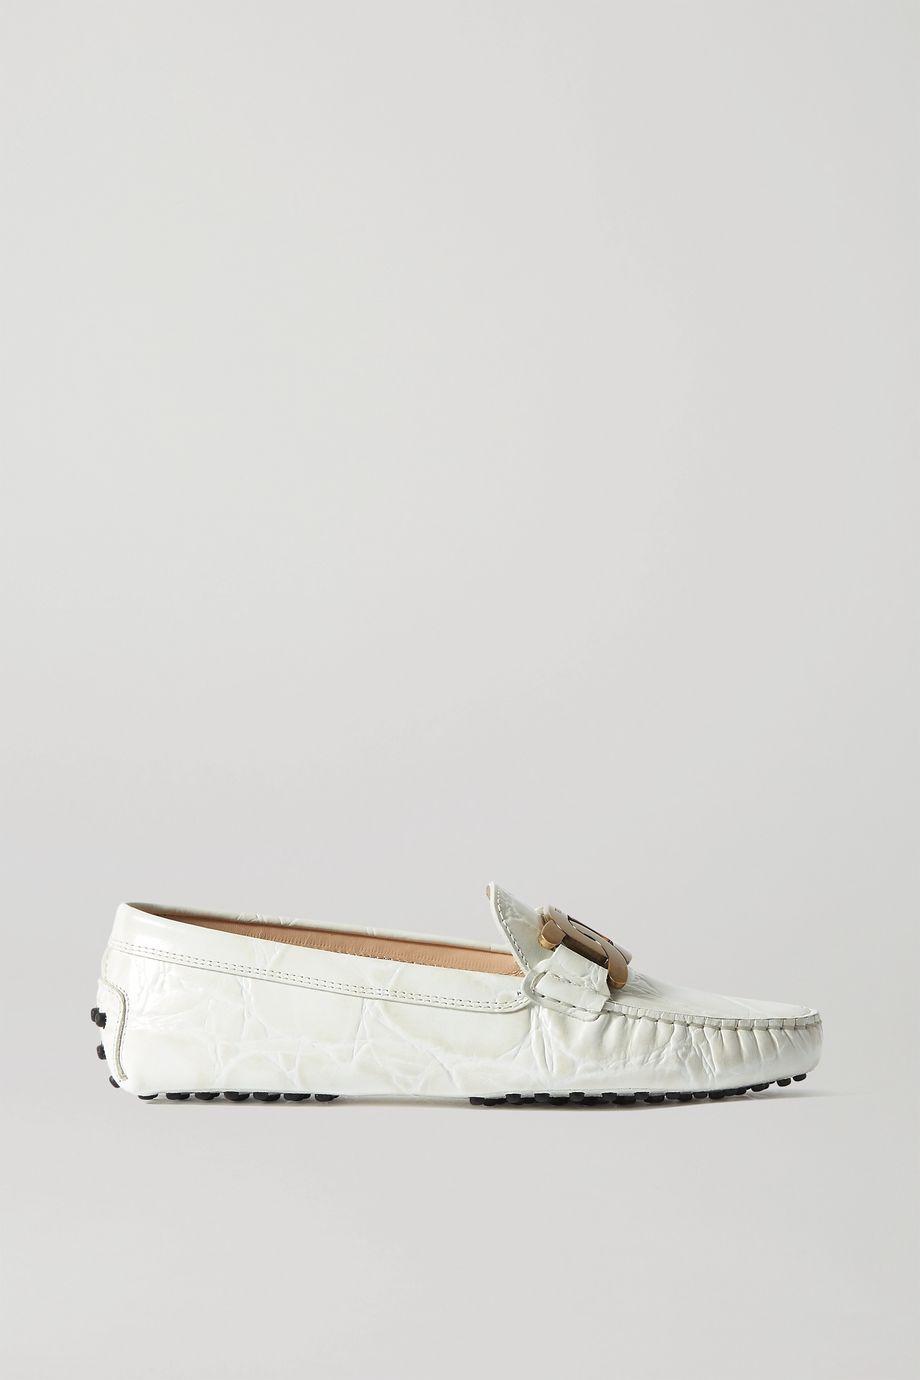 Tod's Gommino Catena verzierte Loafers aus Leder mit Krokodileffekt